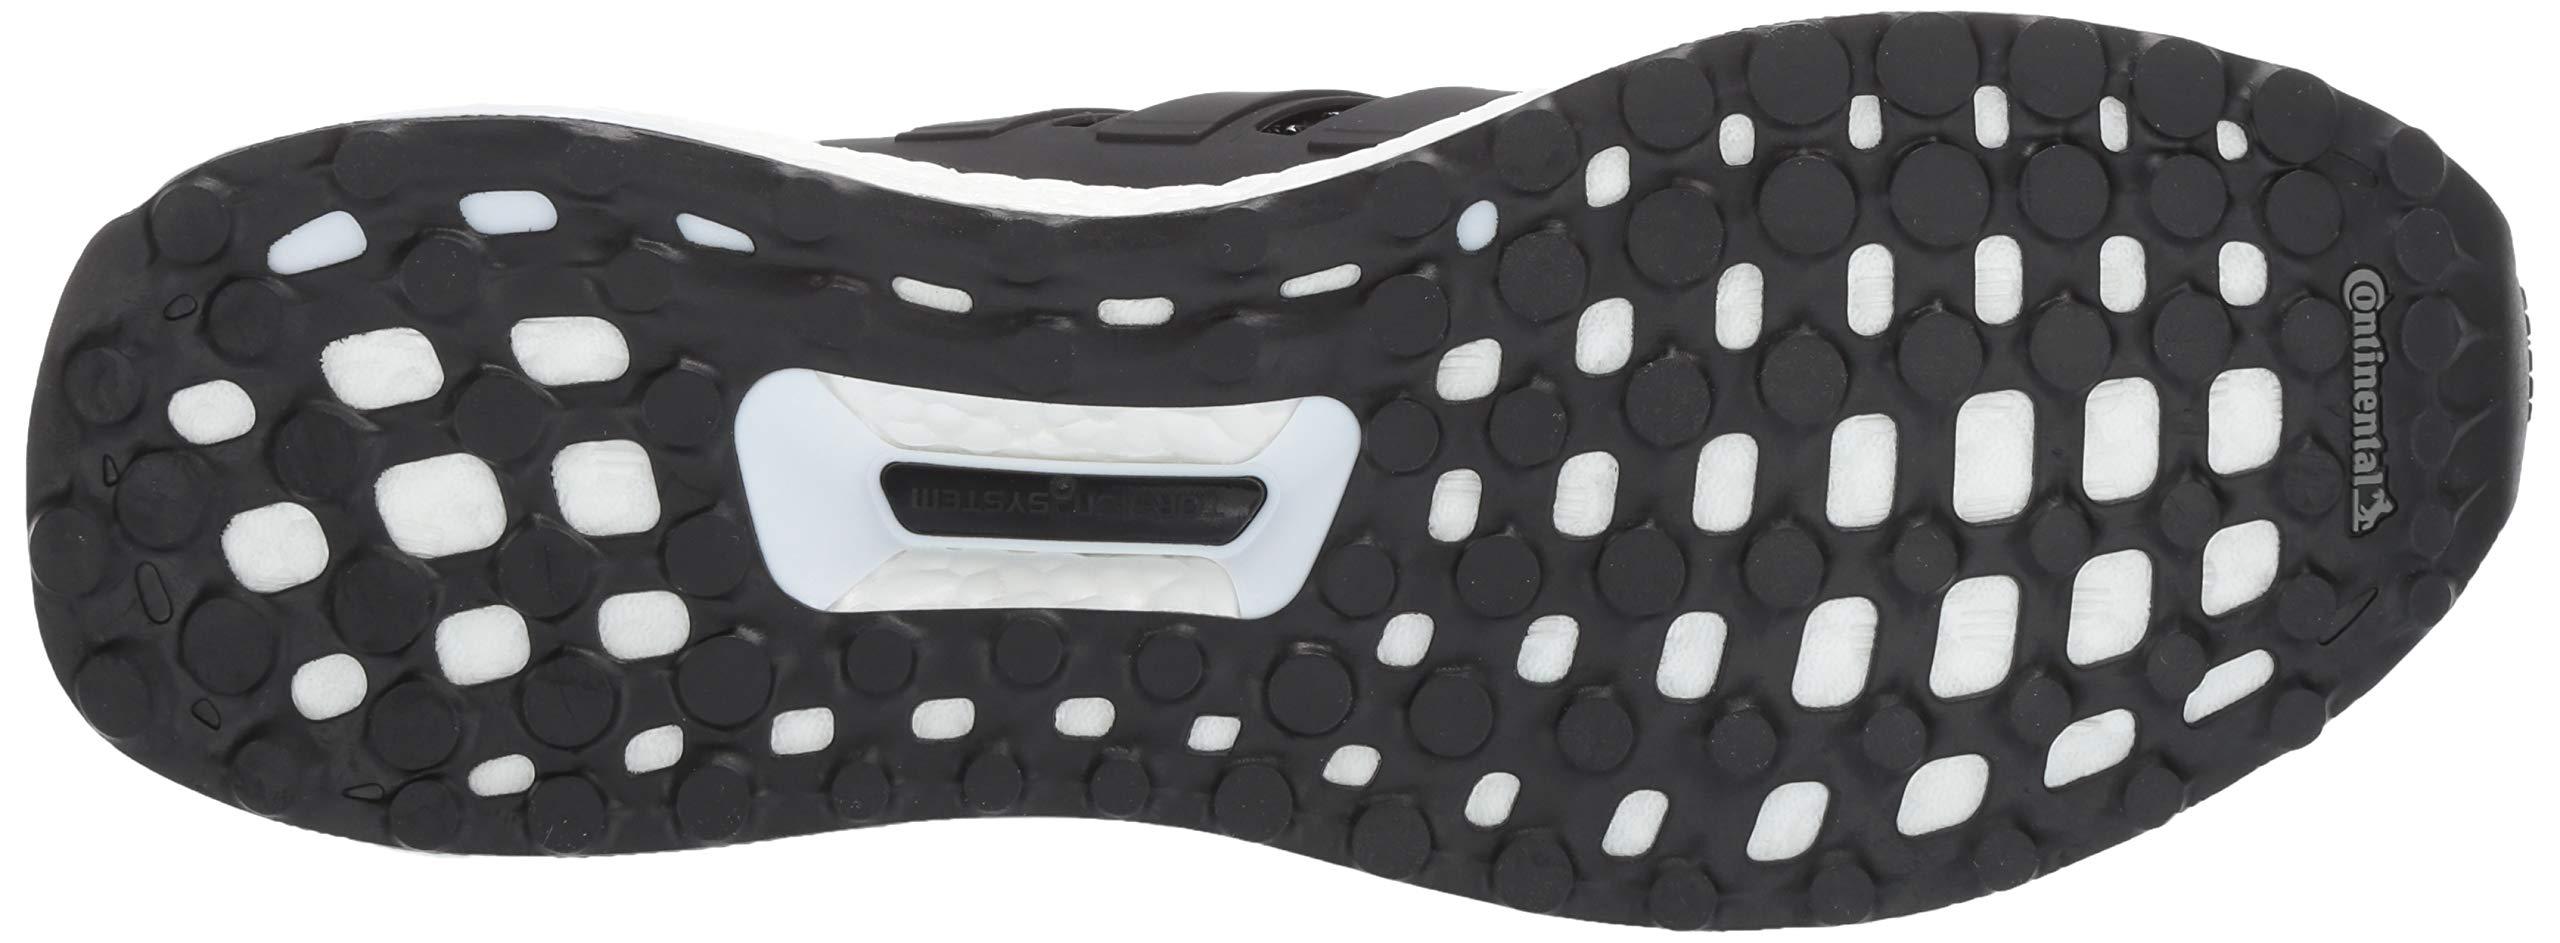 adidas Men's Ultraboost, Black/White, 9 M US by adidas (Image #3)